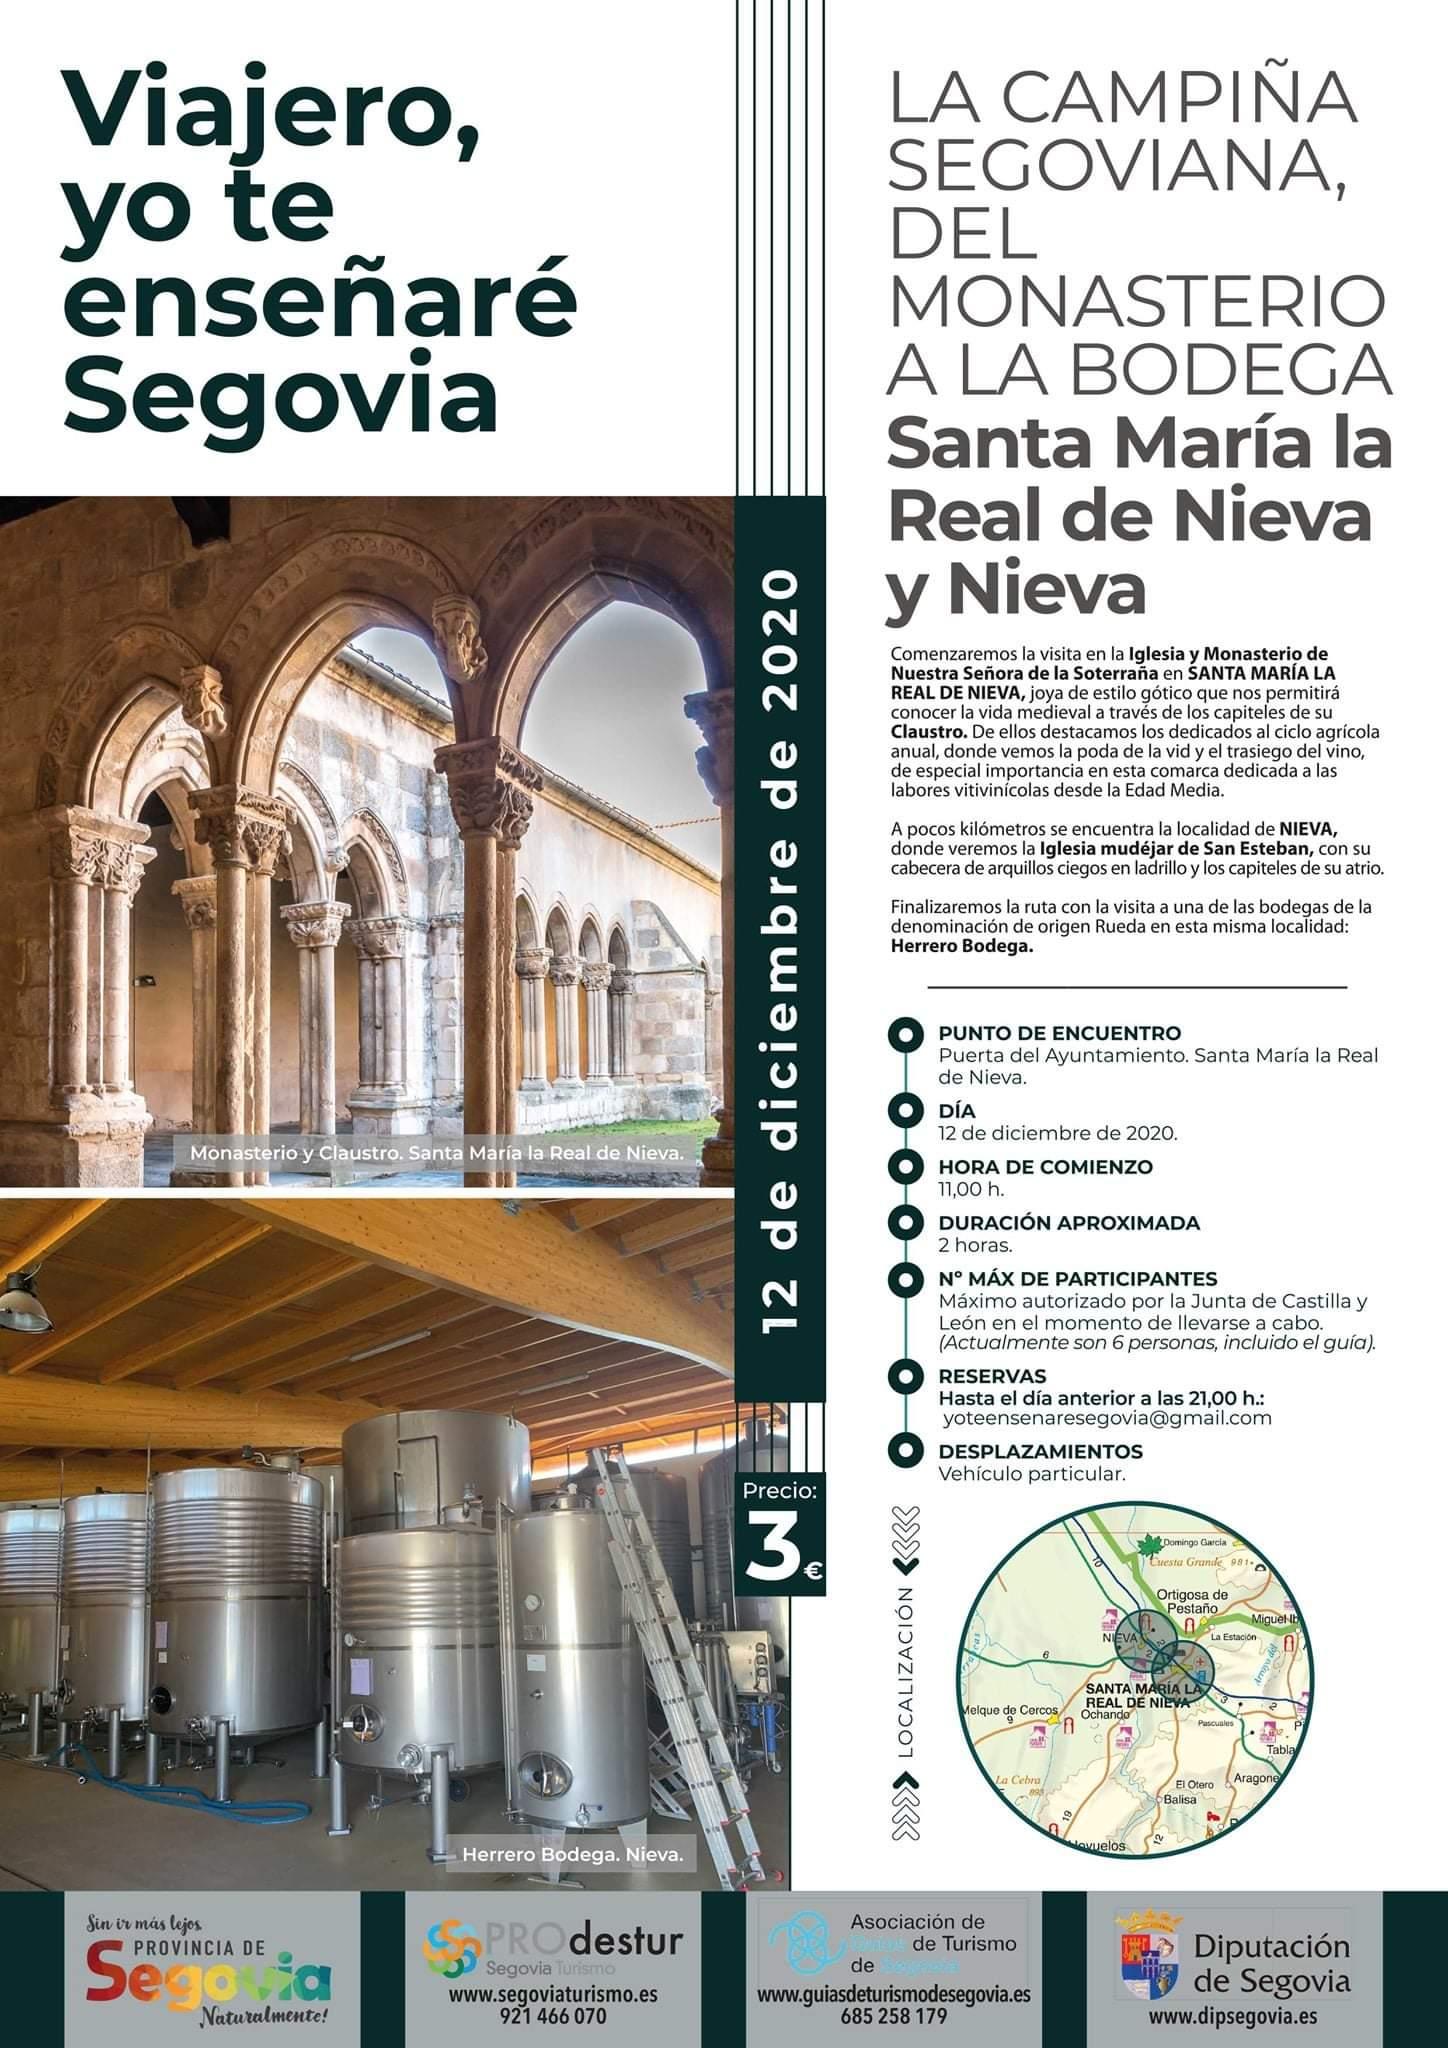 Visitas guiadas en la provincia de Segovia